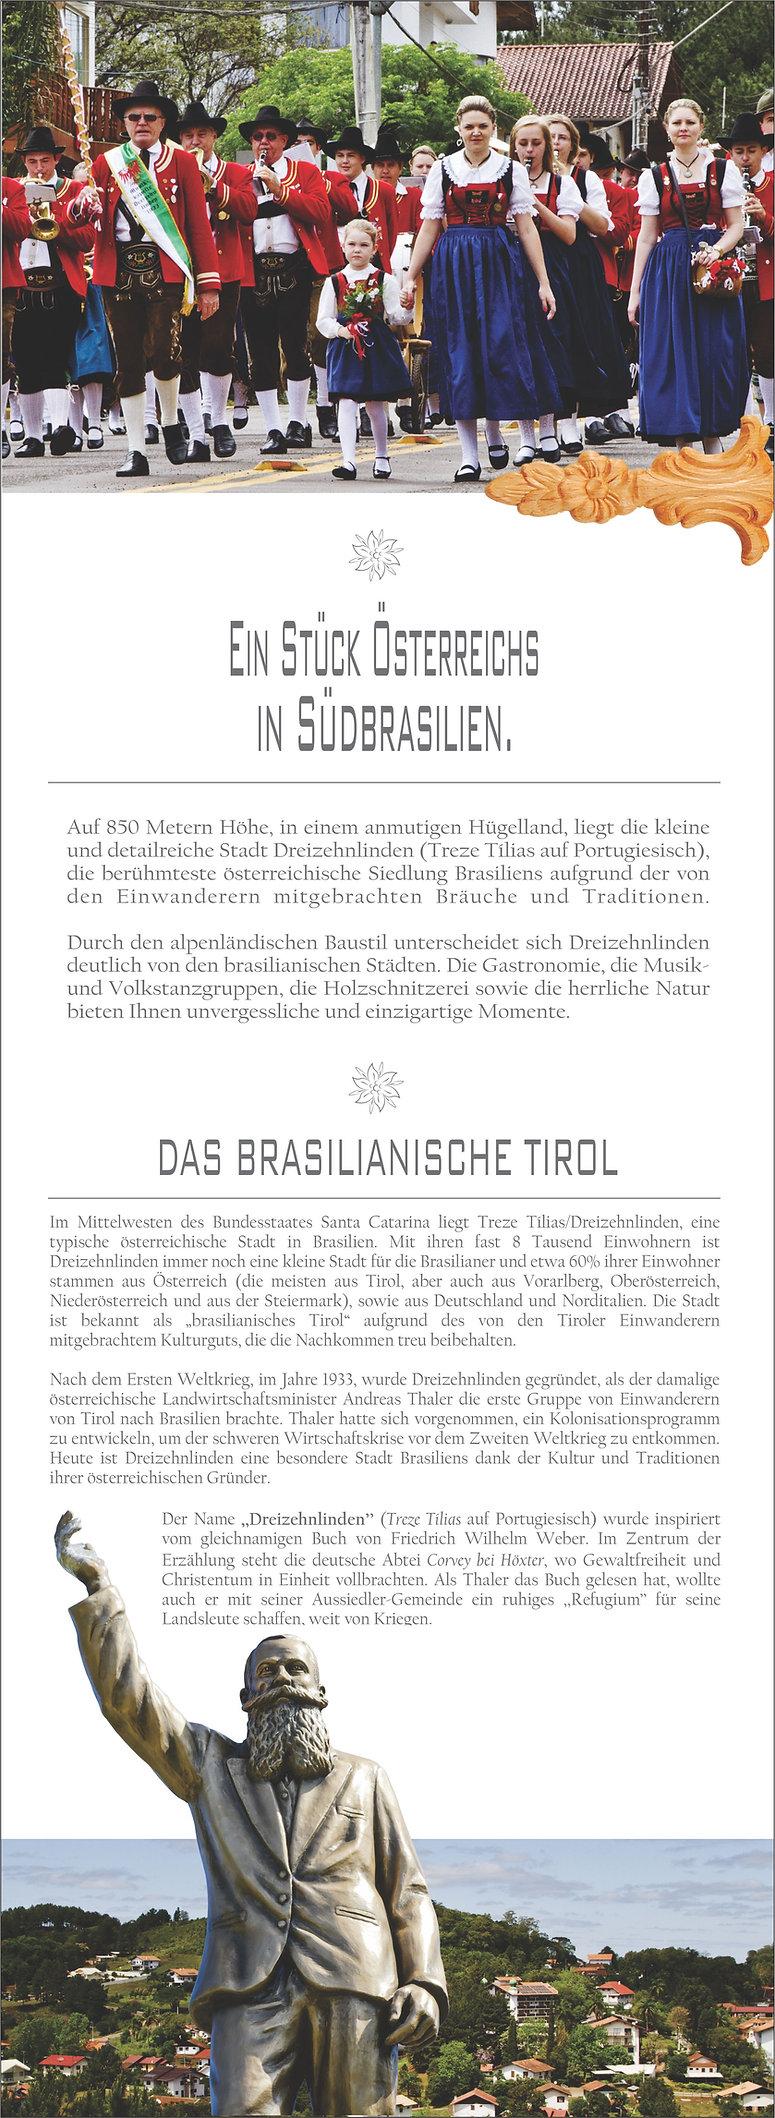 Dreizehnlinden, brasilien, treze tilias, mk, brasilianische tirol